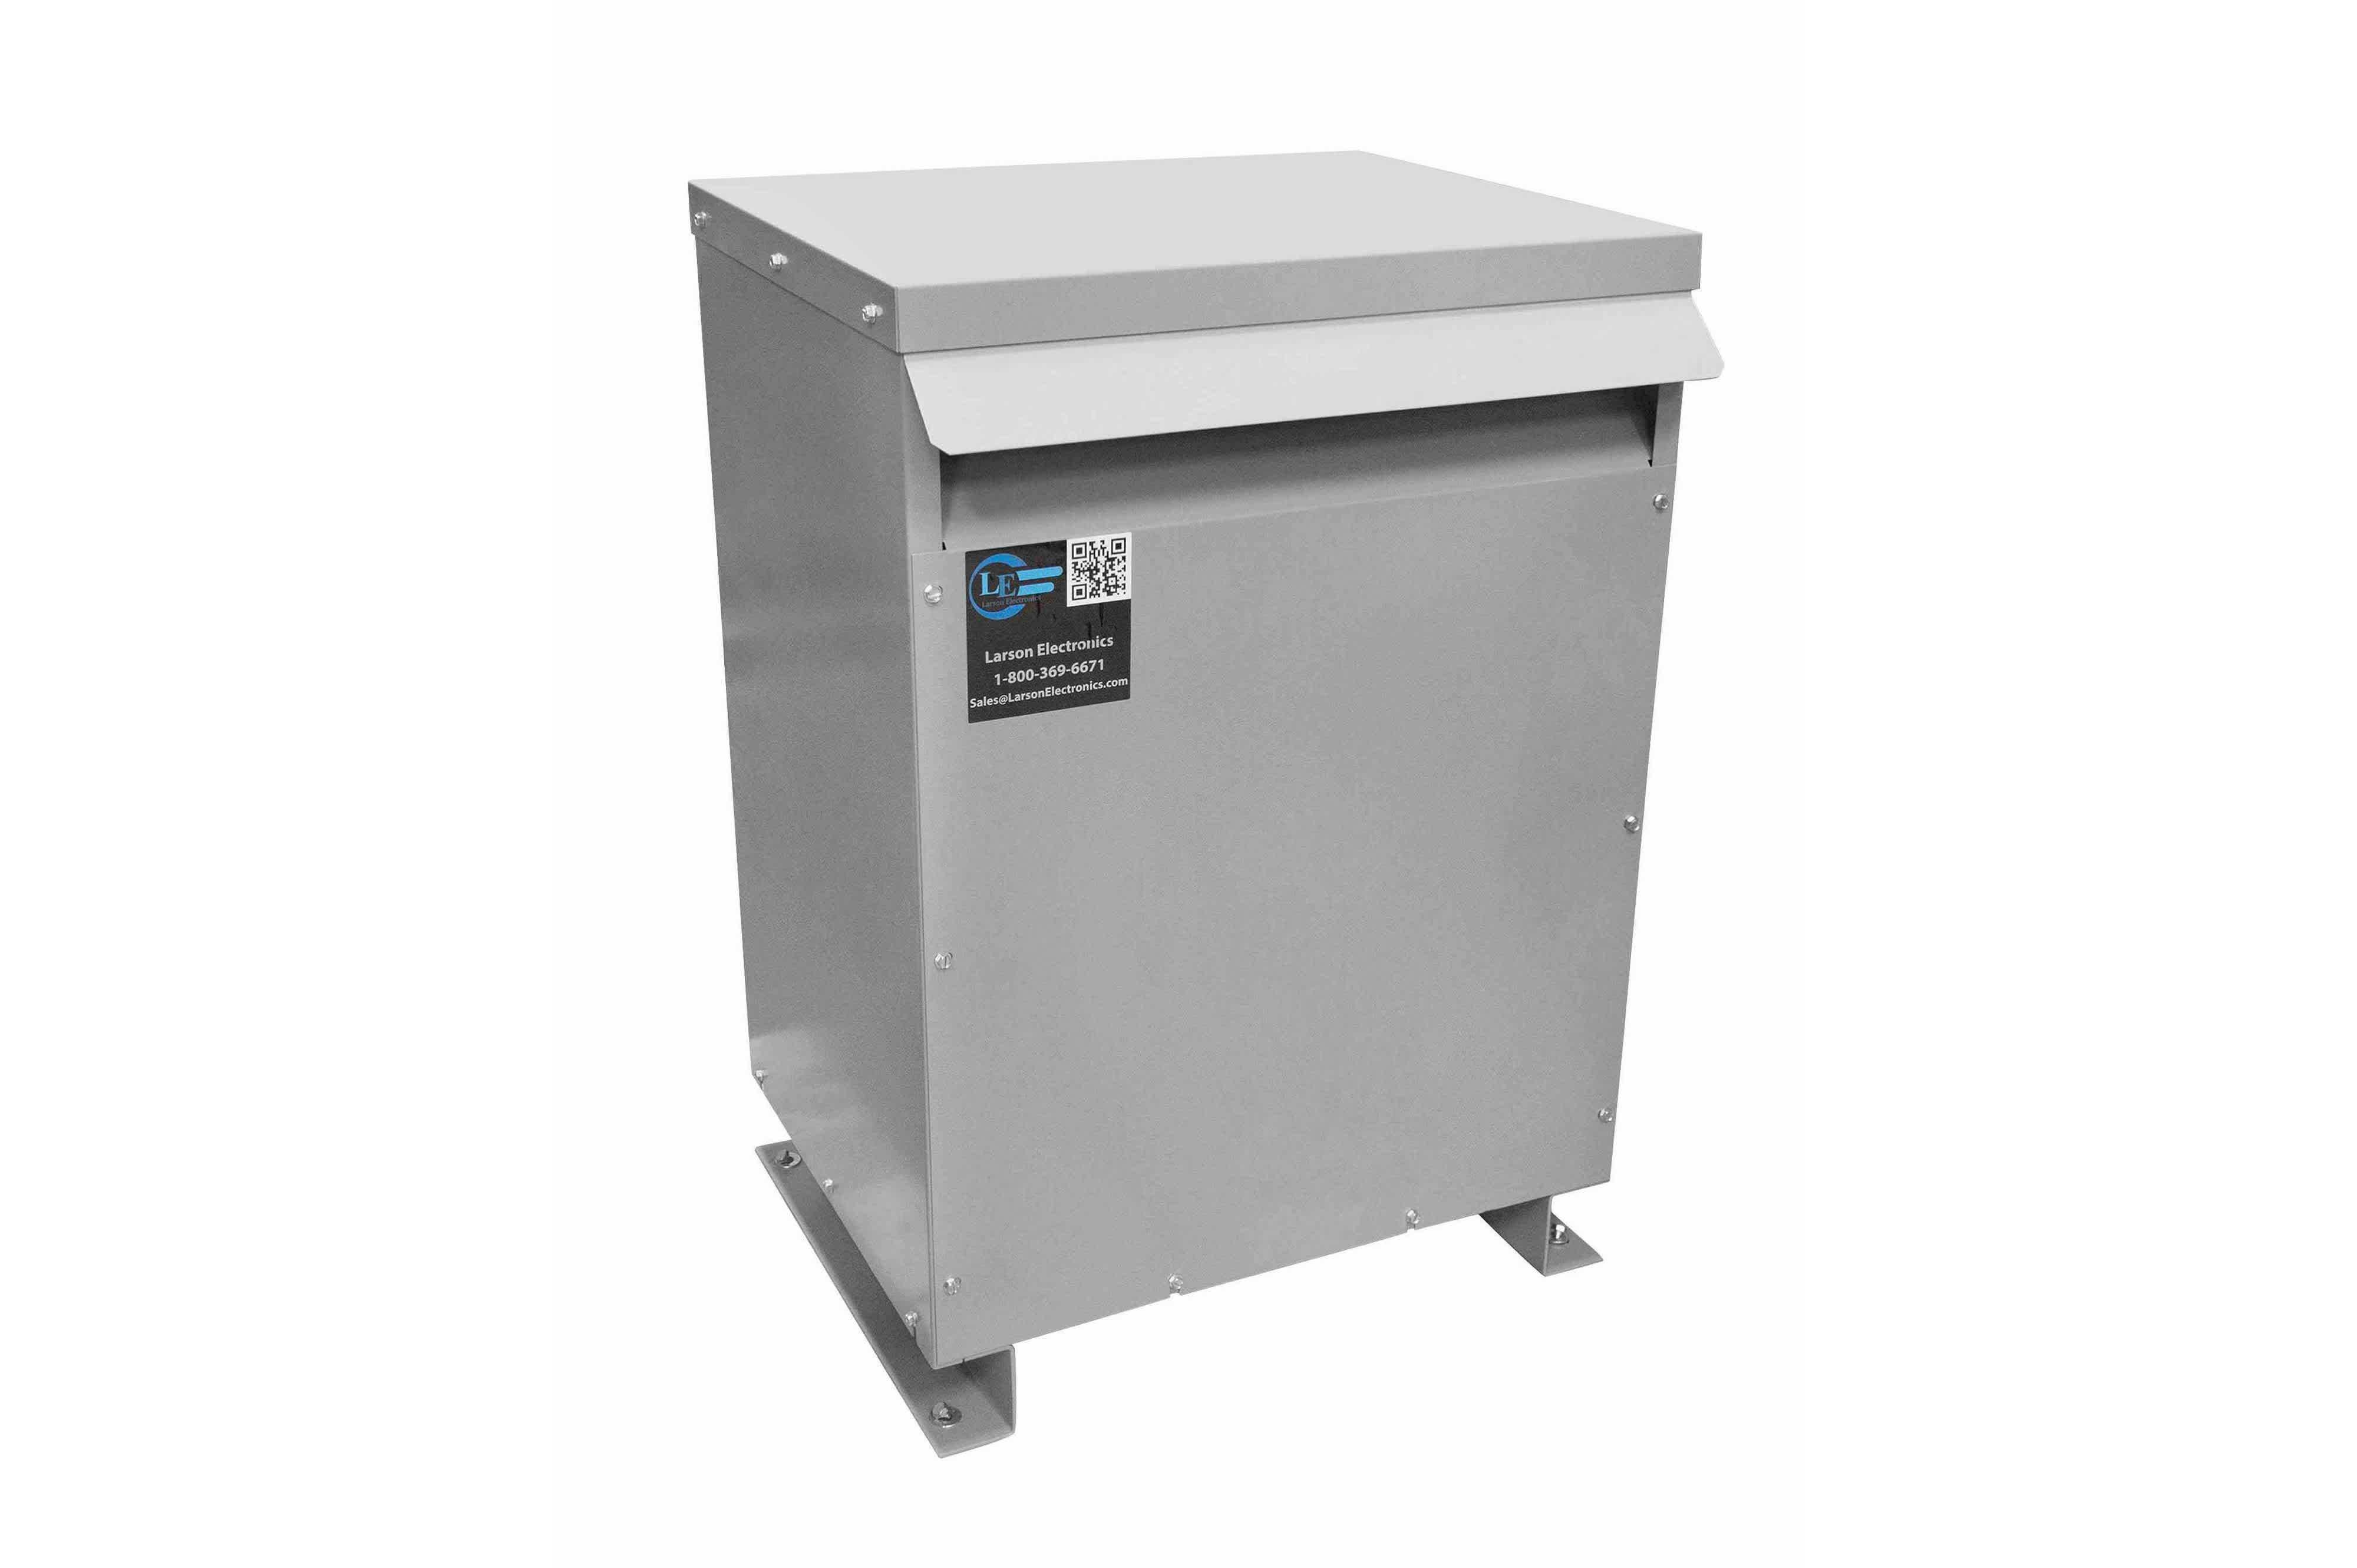 750 kVA 3PH Isolation Transformer, 460V Wye Primary, 380V Delta Secondary, N3R, Ventilated, 60 Hz